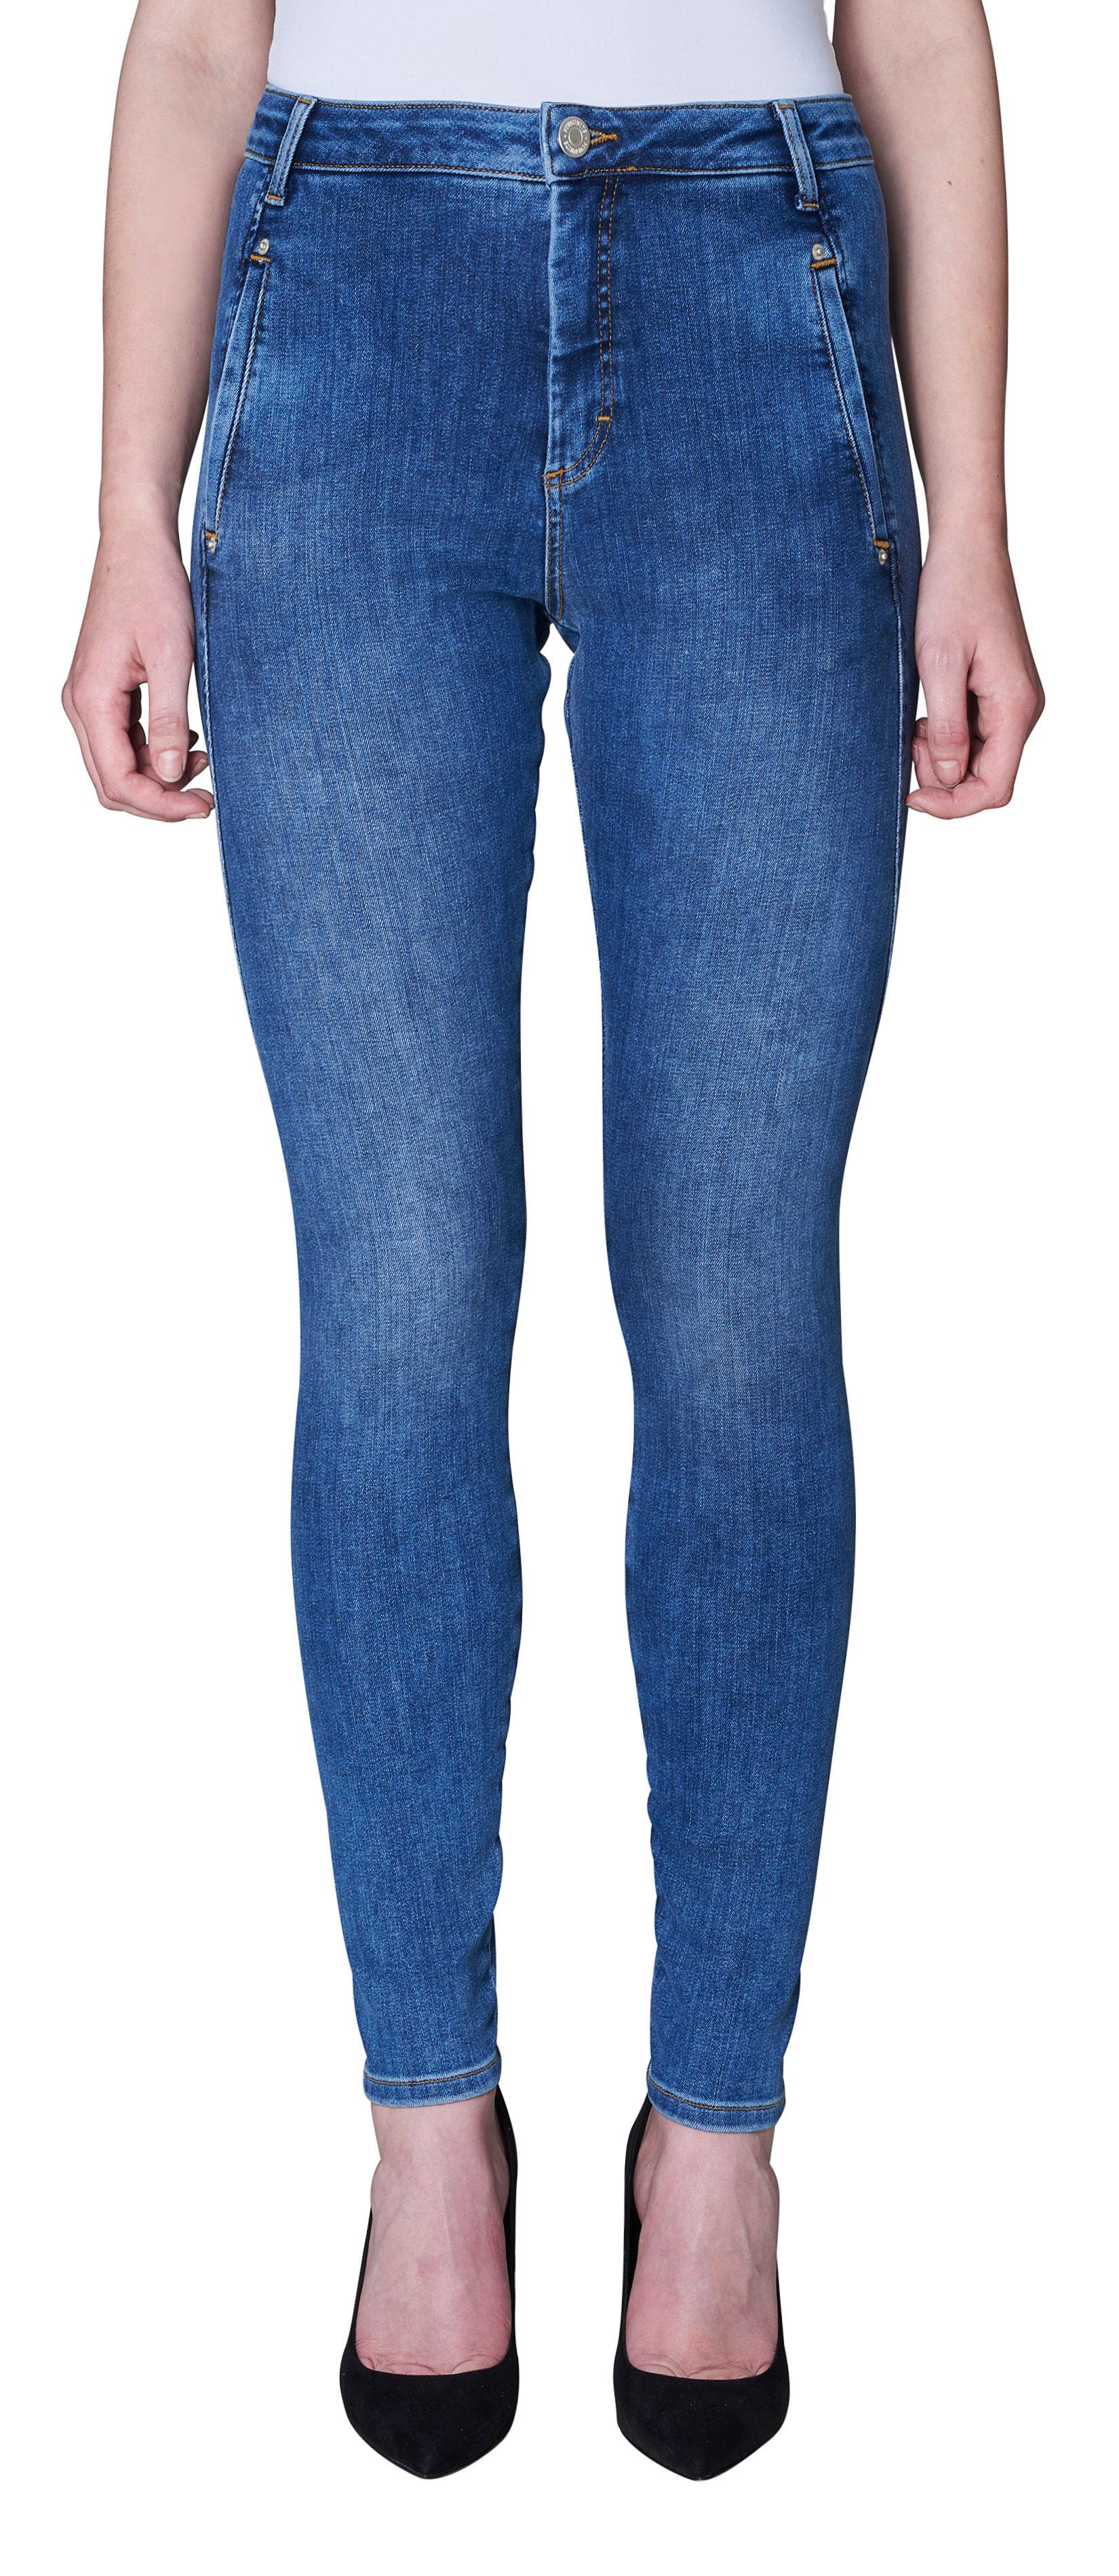 Fiveunits olabukse, Jolie blå jeans fra Five Units, bukse